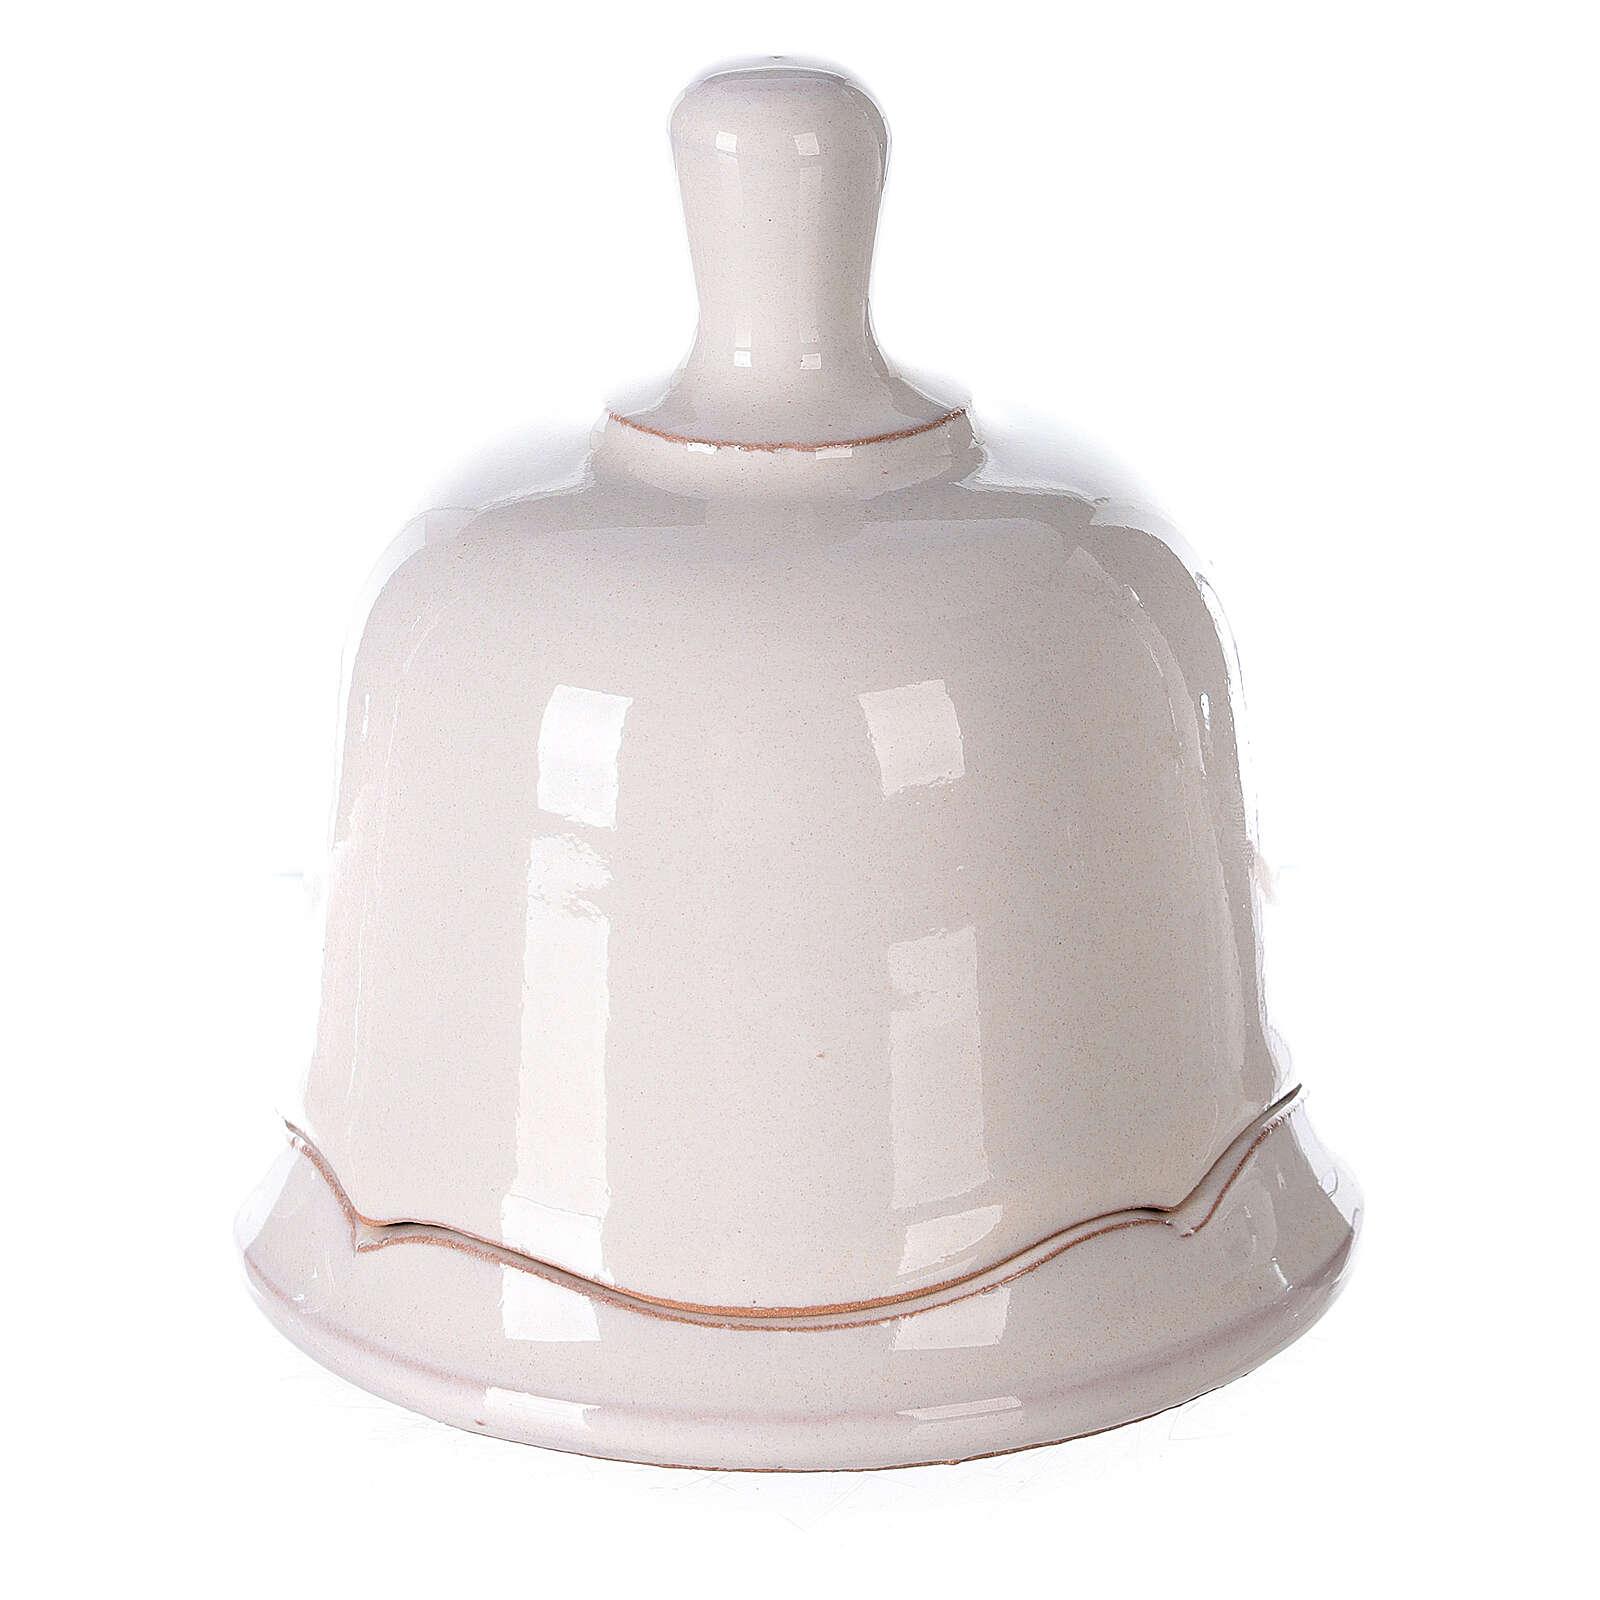 Terracotta Holy Family set in white openable bell Deruta 10 cm 4